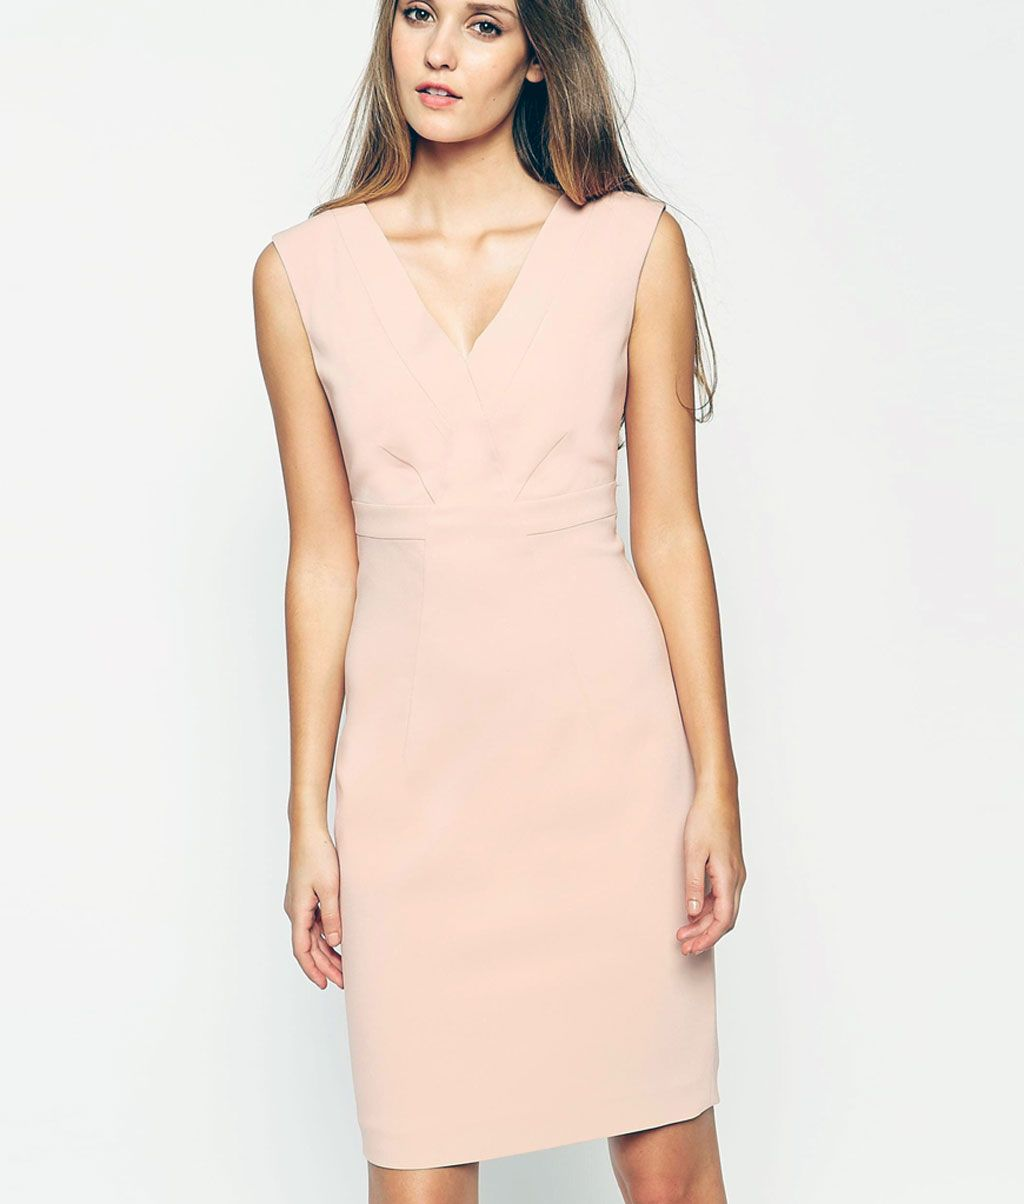 1ff106913e8b8 pudra rengi kalem elbise modelleri | elbisemodelleri-sitesi.com ...